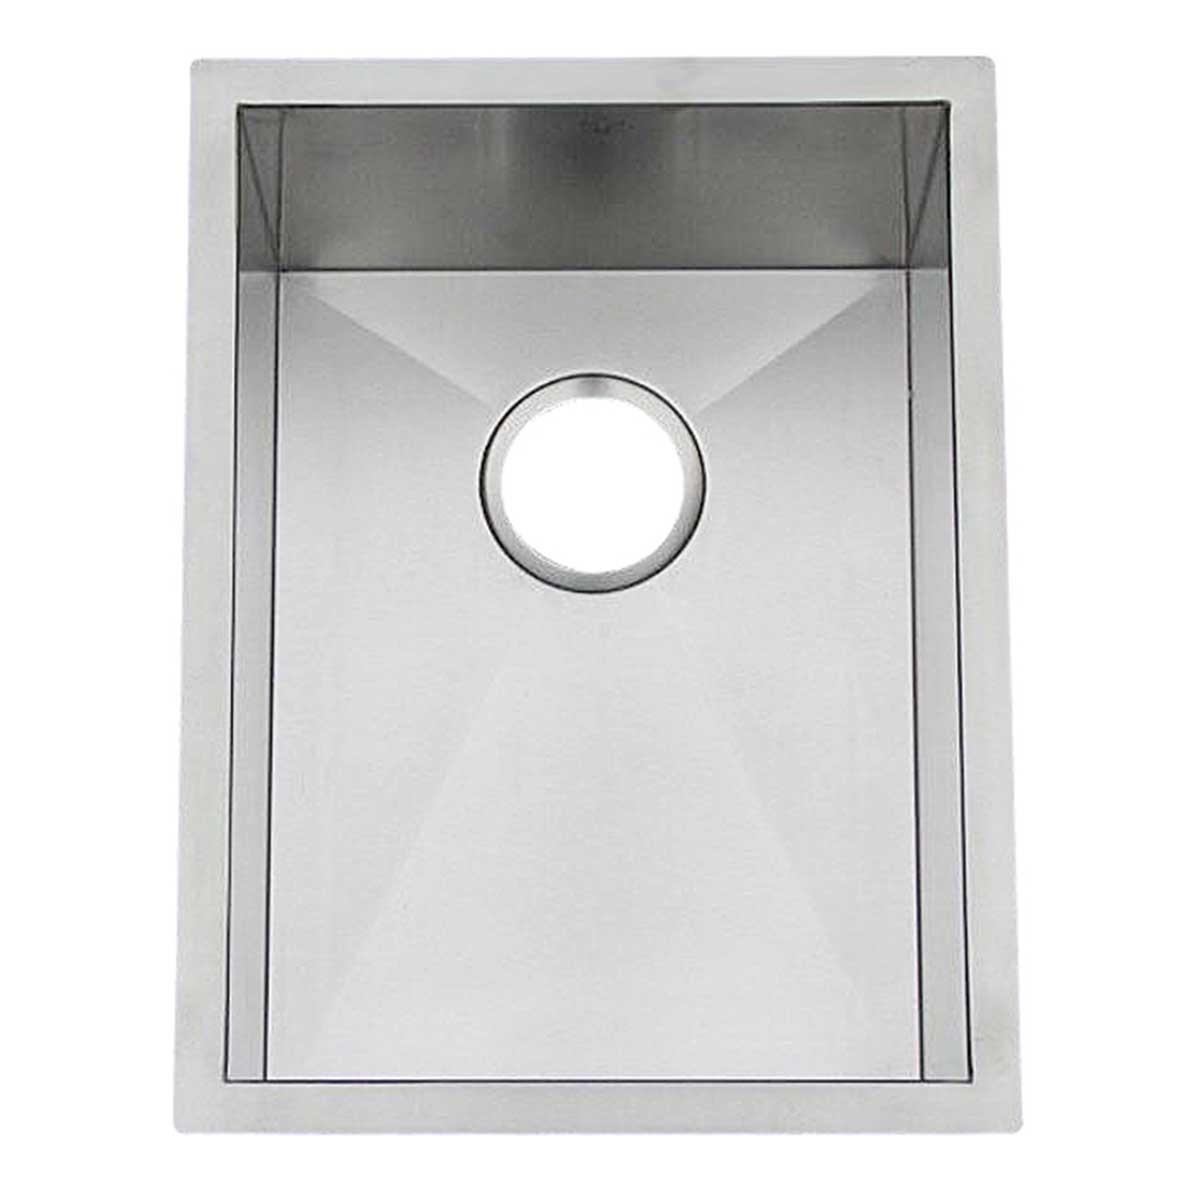 CPUZ1519-D10 Artisan Chef Pro Sink